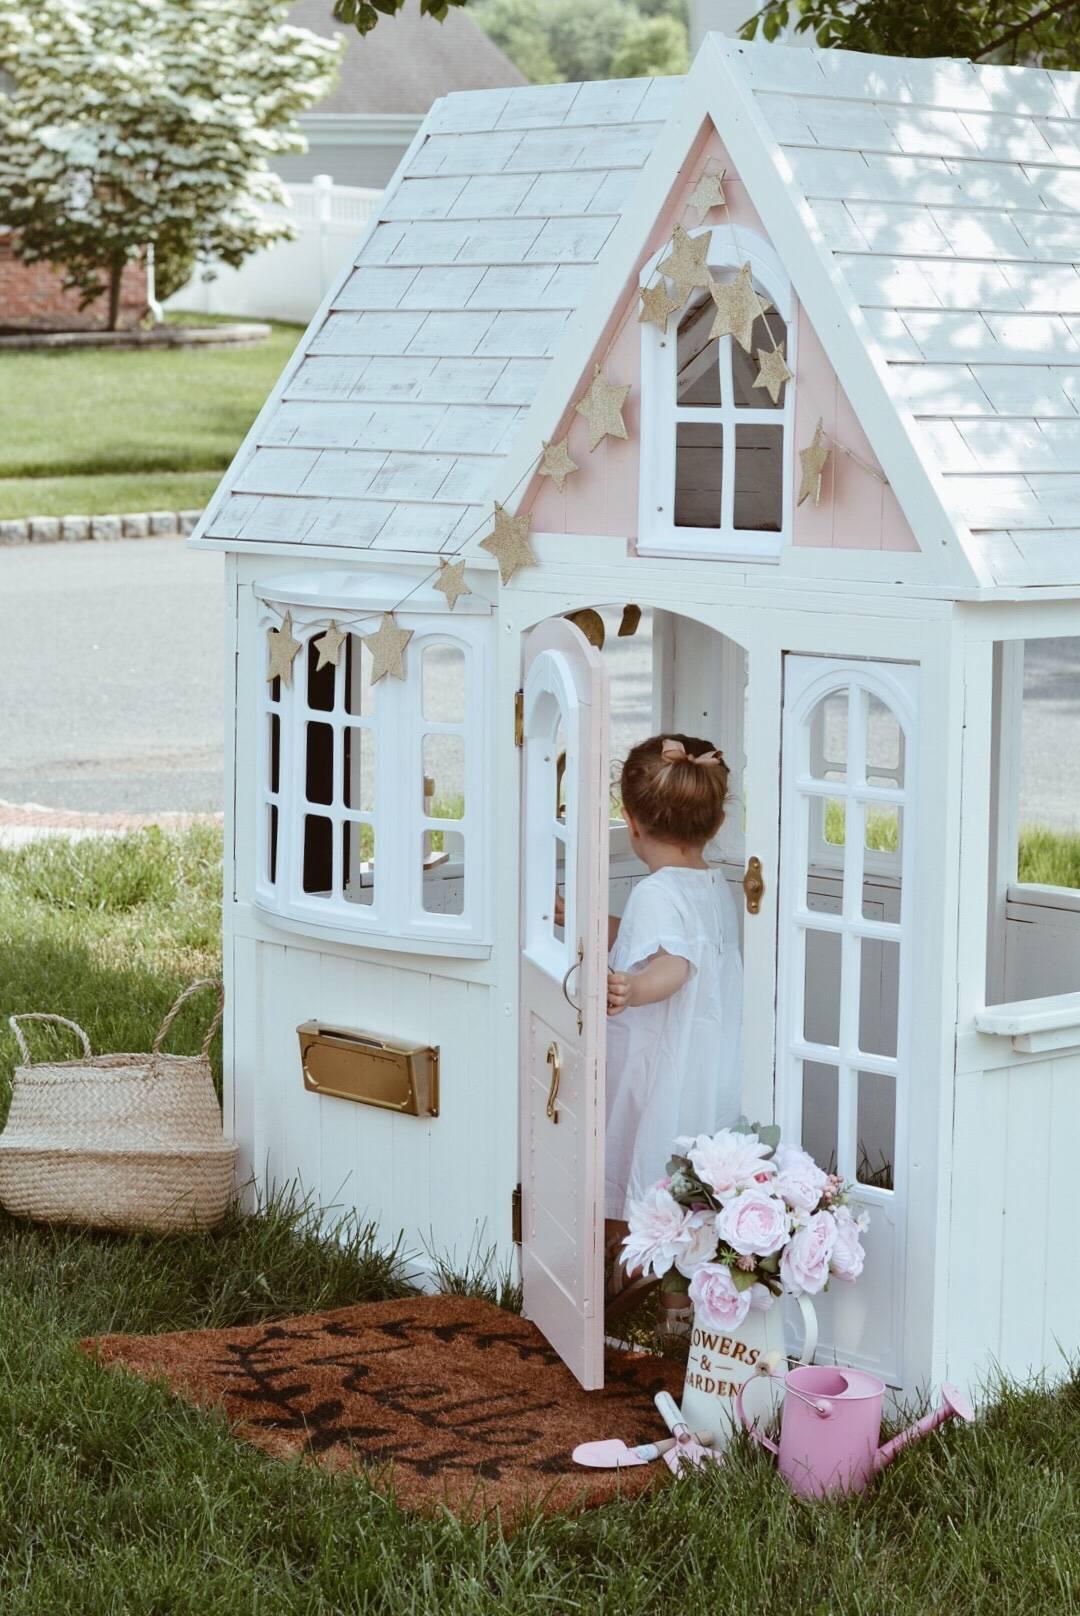 Costco Playhouse Hack How To Transform An Outdoor Cedar